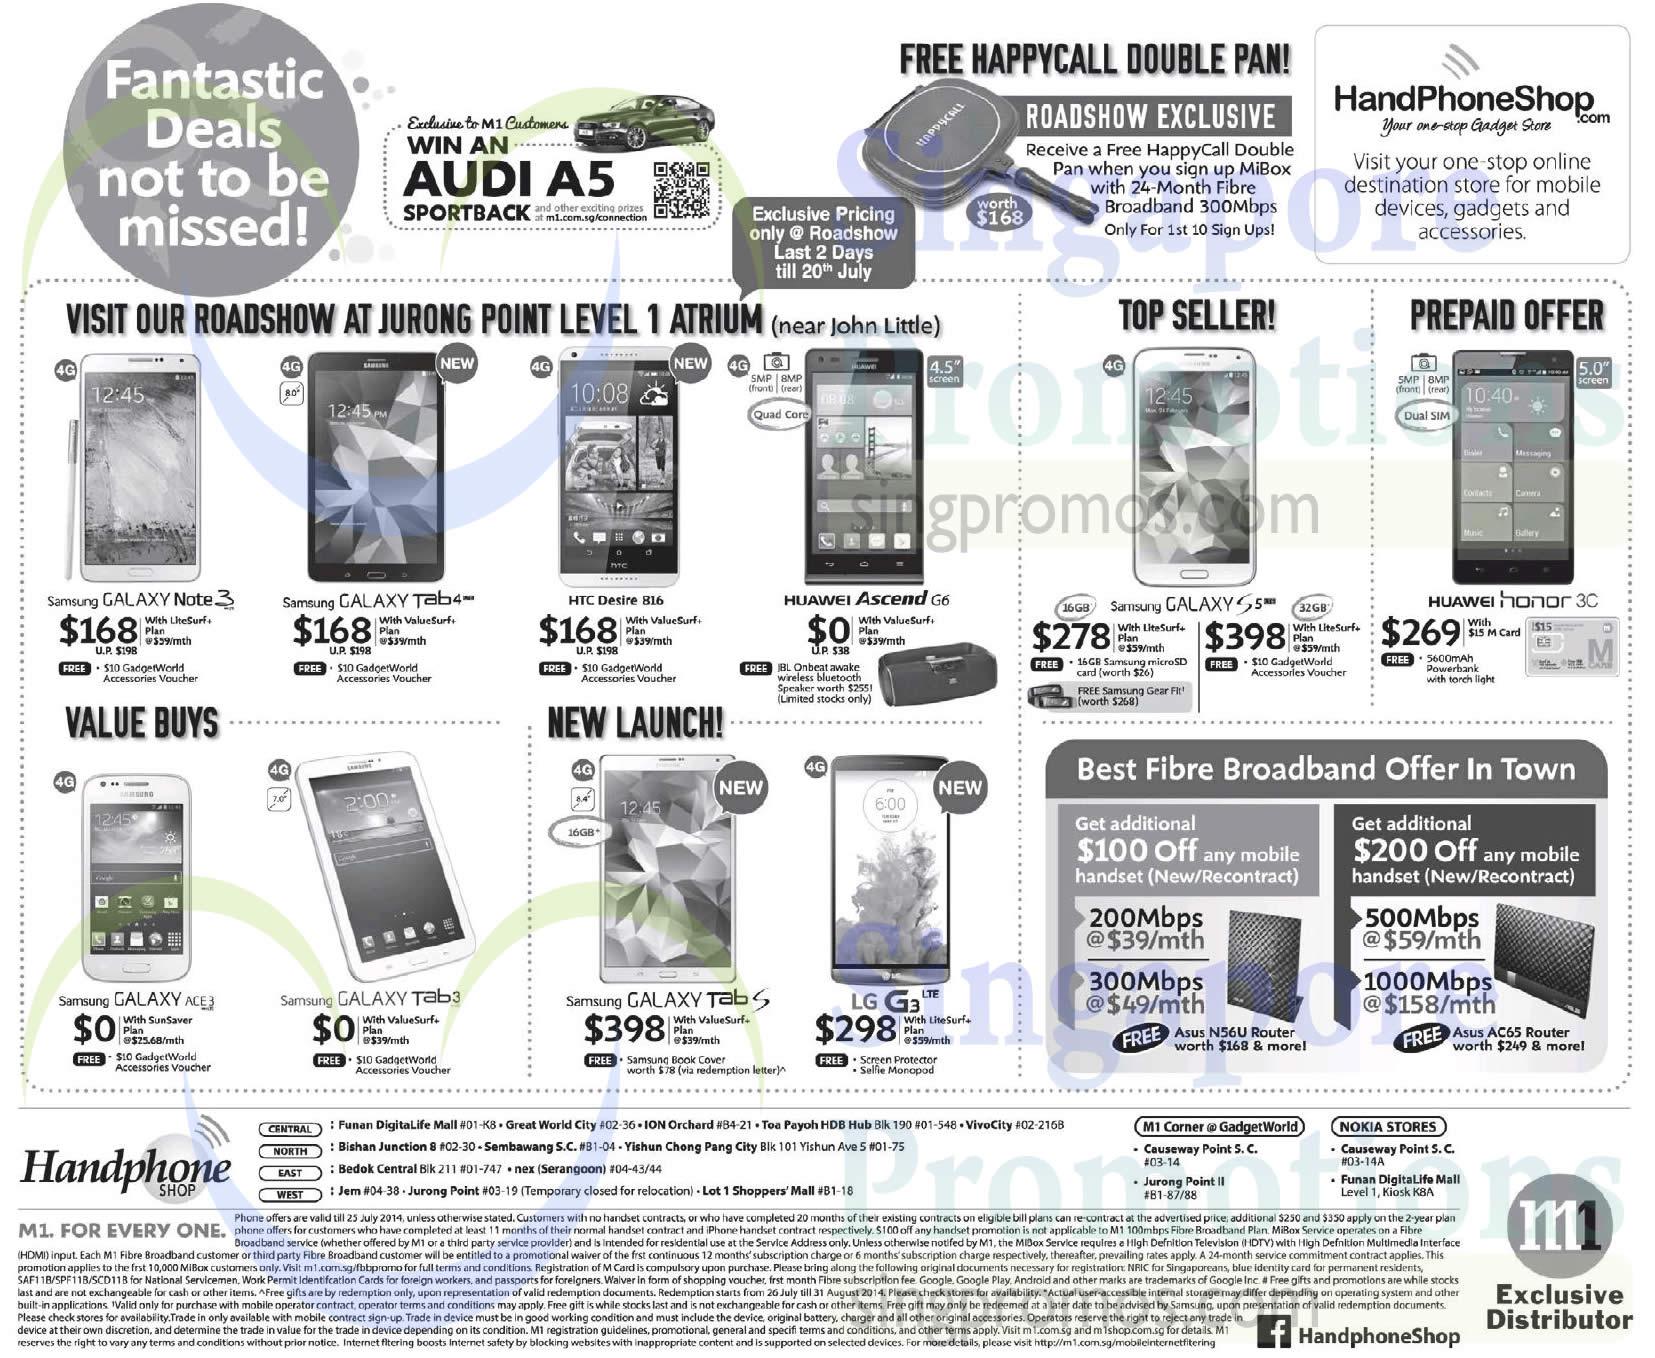 Handphone Shop Roadshow Samsung Galaxy Note 3 Tab 4 S